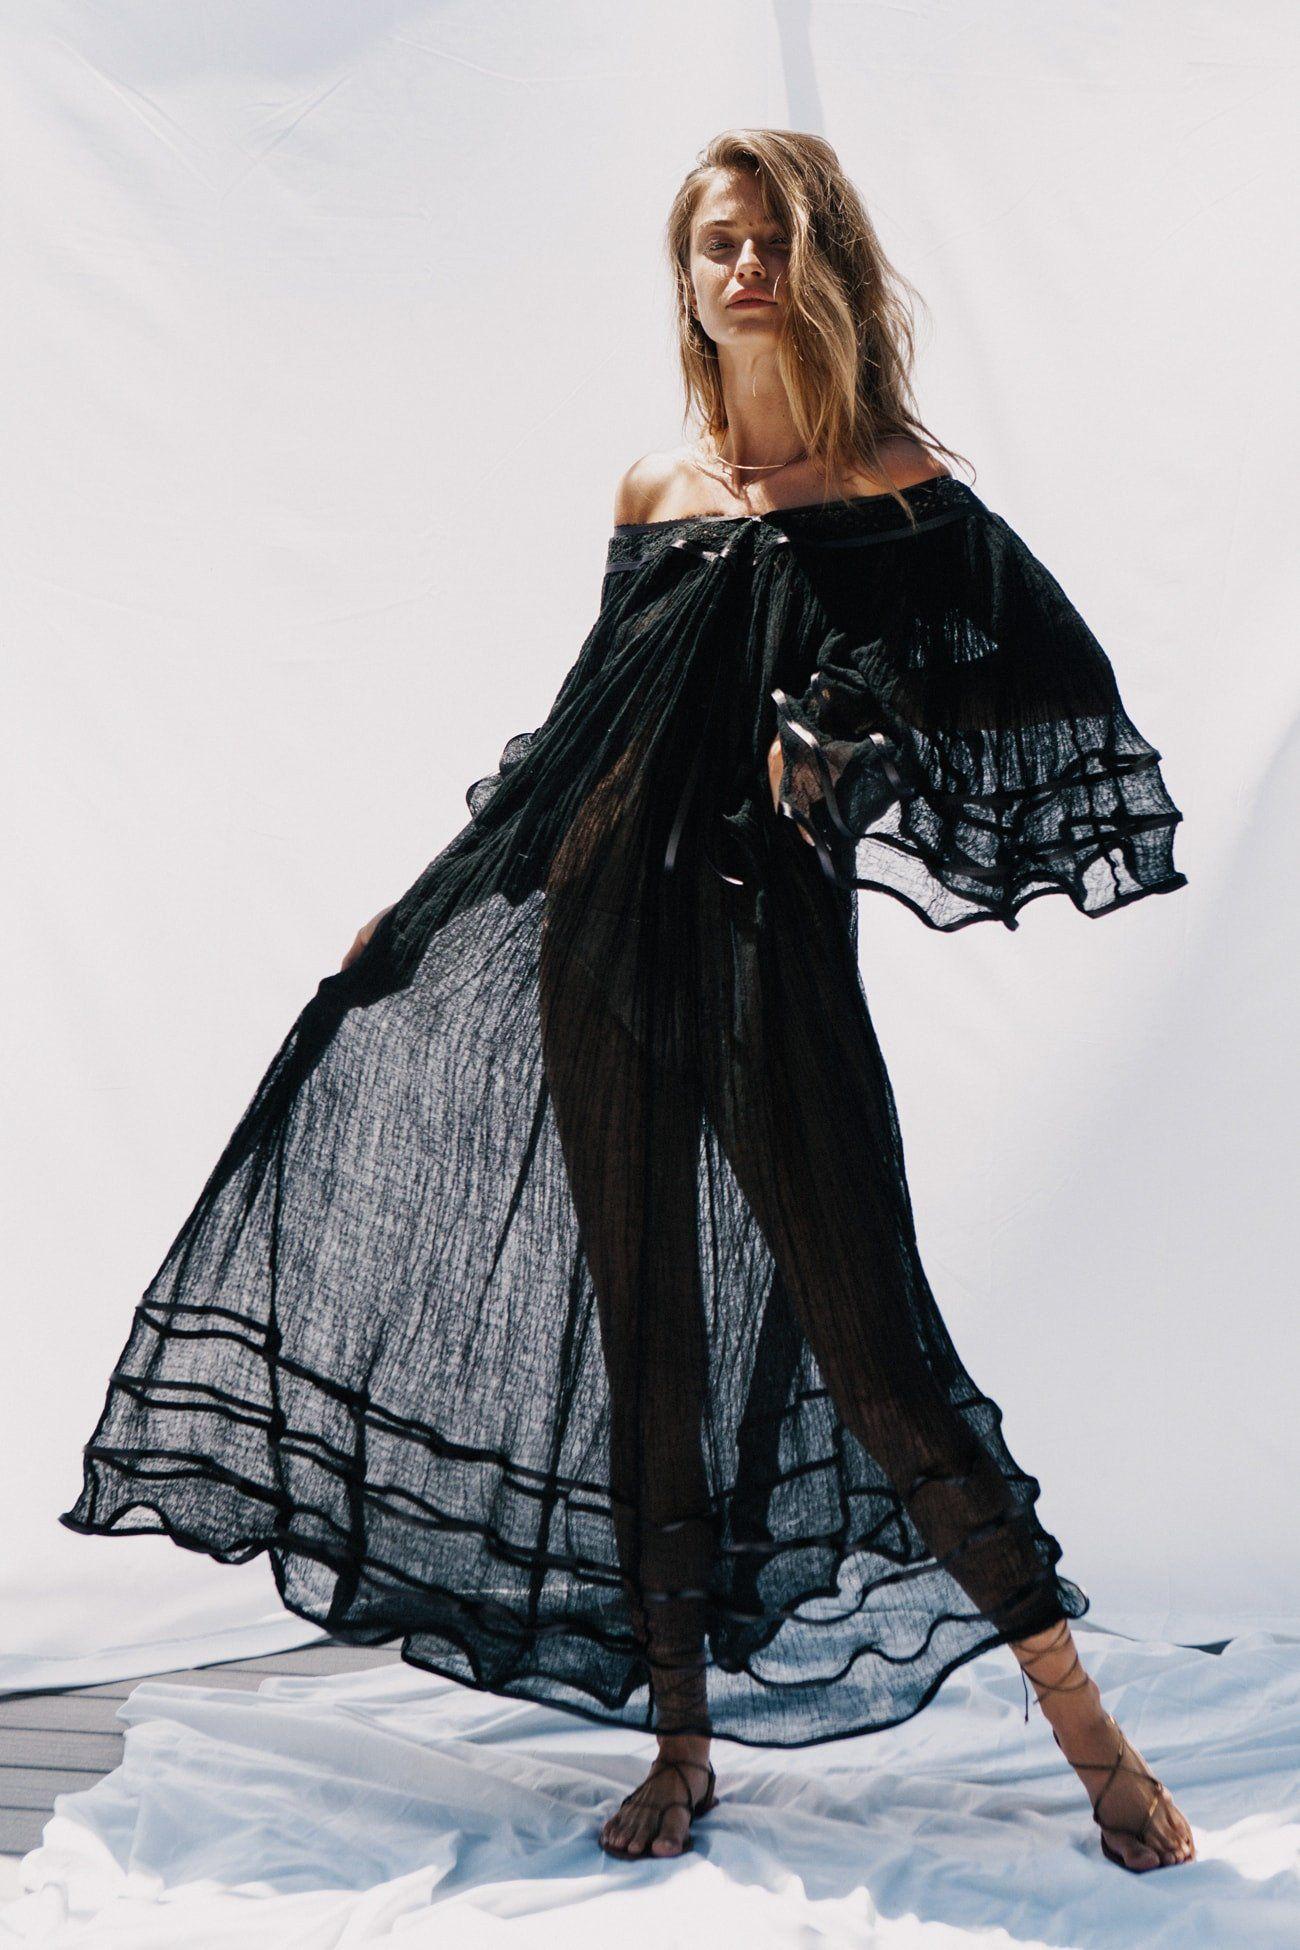 Stevie Nicks Maxi Dress In 2021 Stevie Nicks Style Maxi Dress Stevie Nicks [ 1950 x 1300 Pixel ]